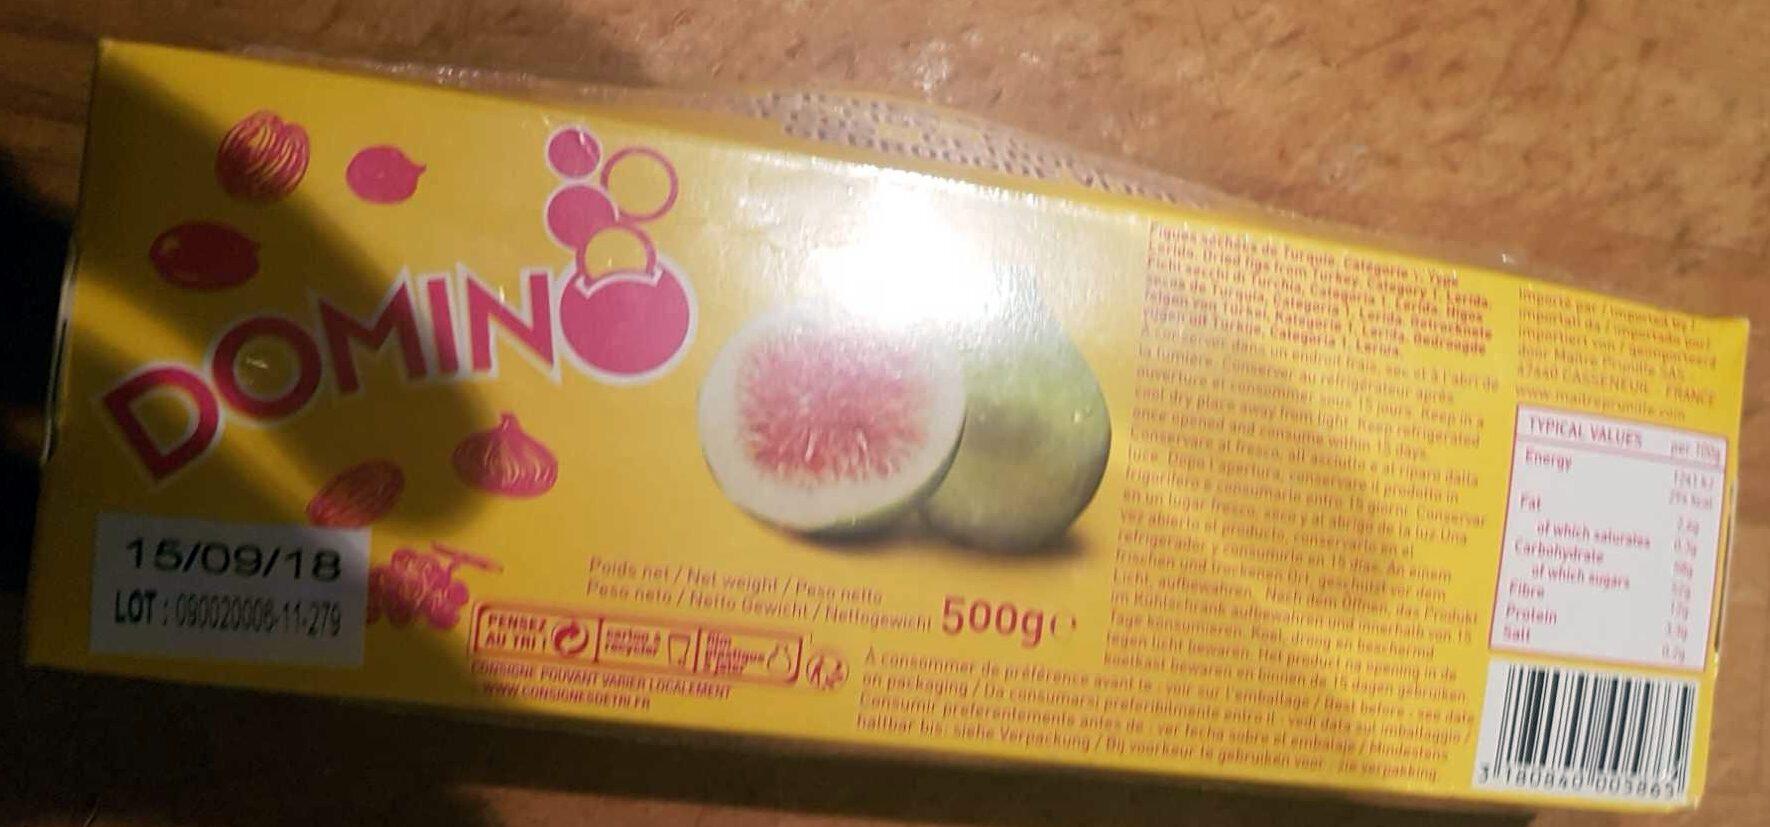 Figues séchées 500GR DOMINO - Product - fr